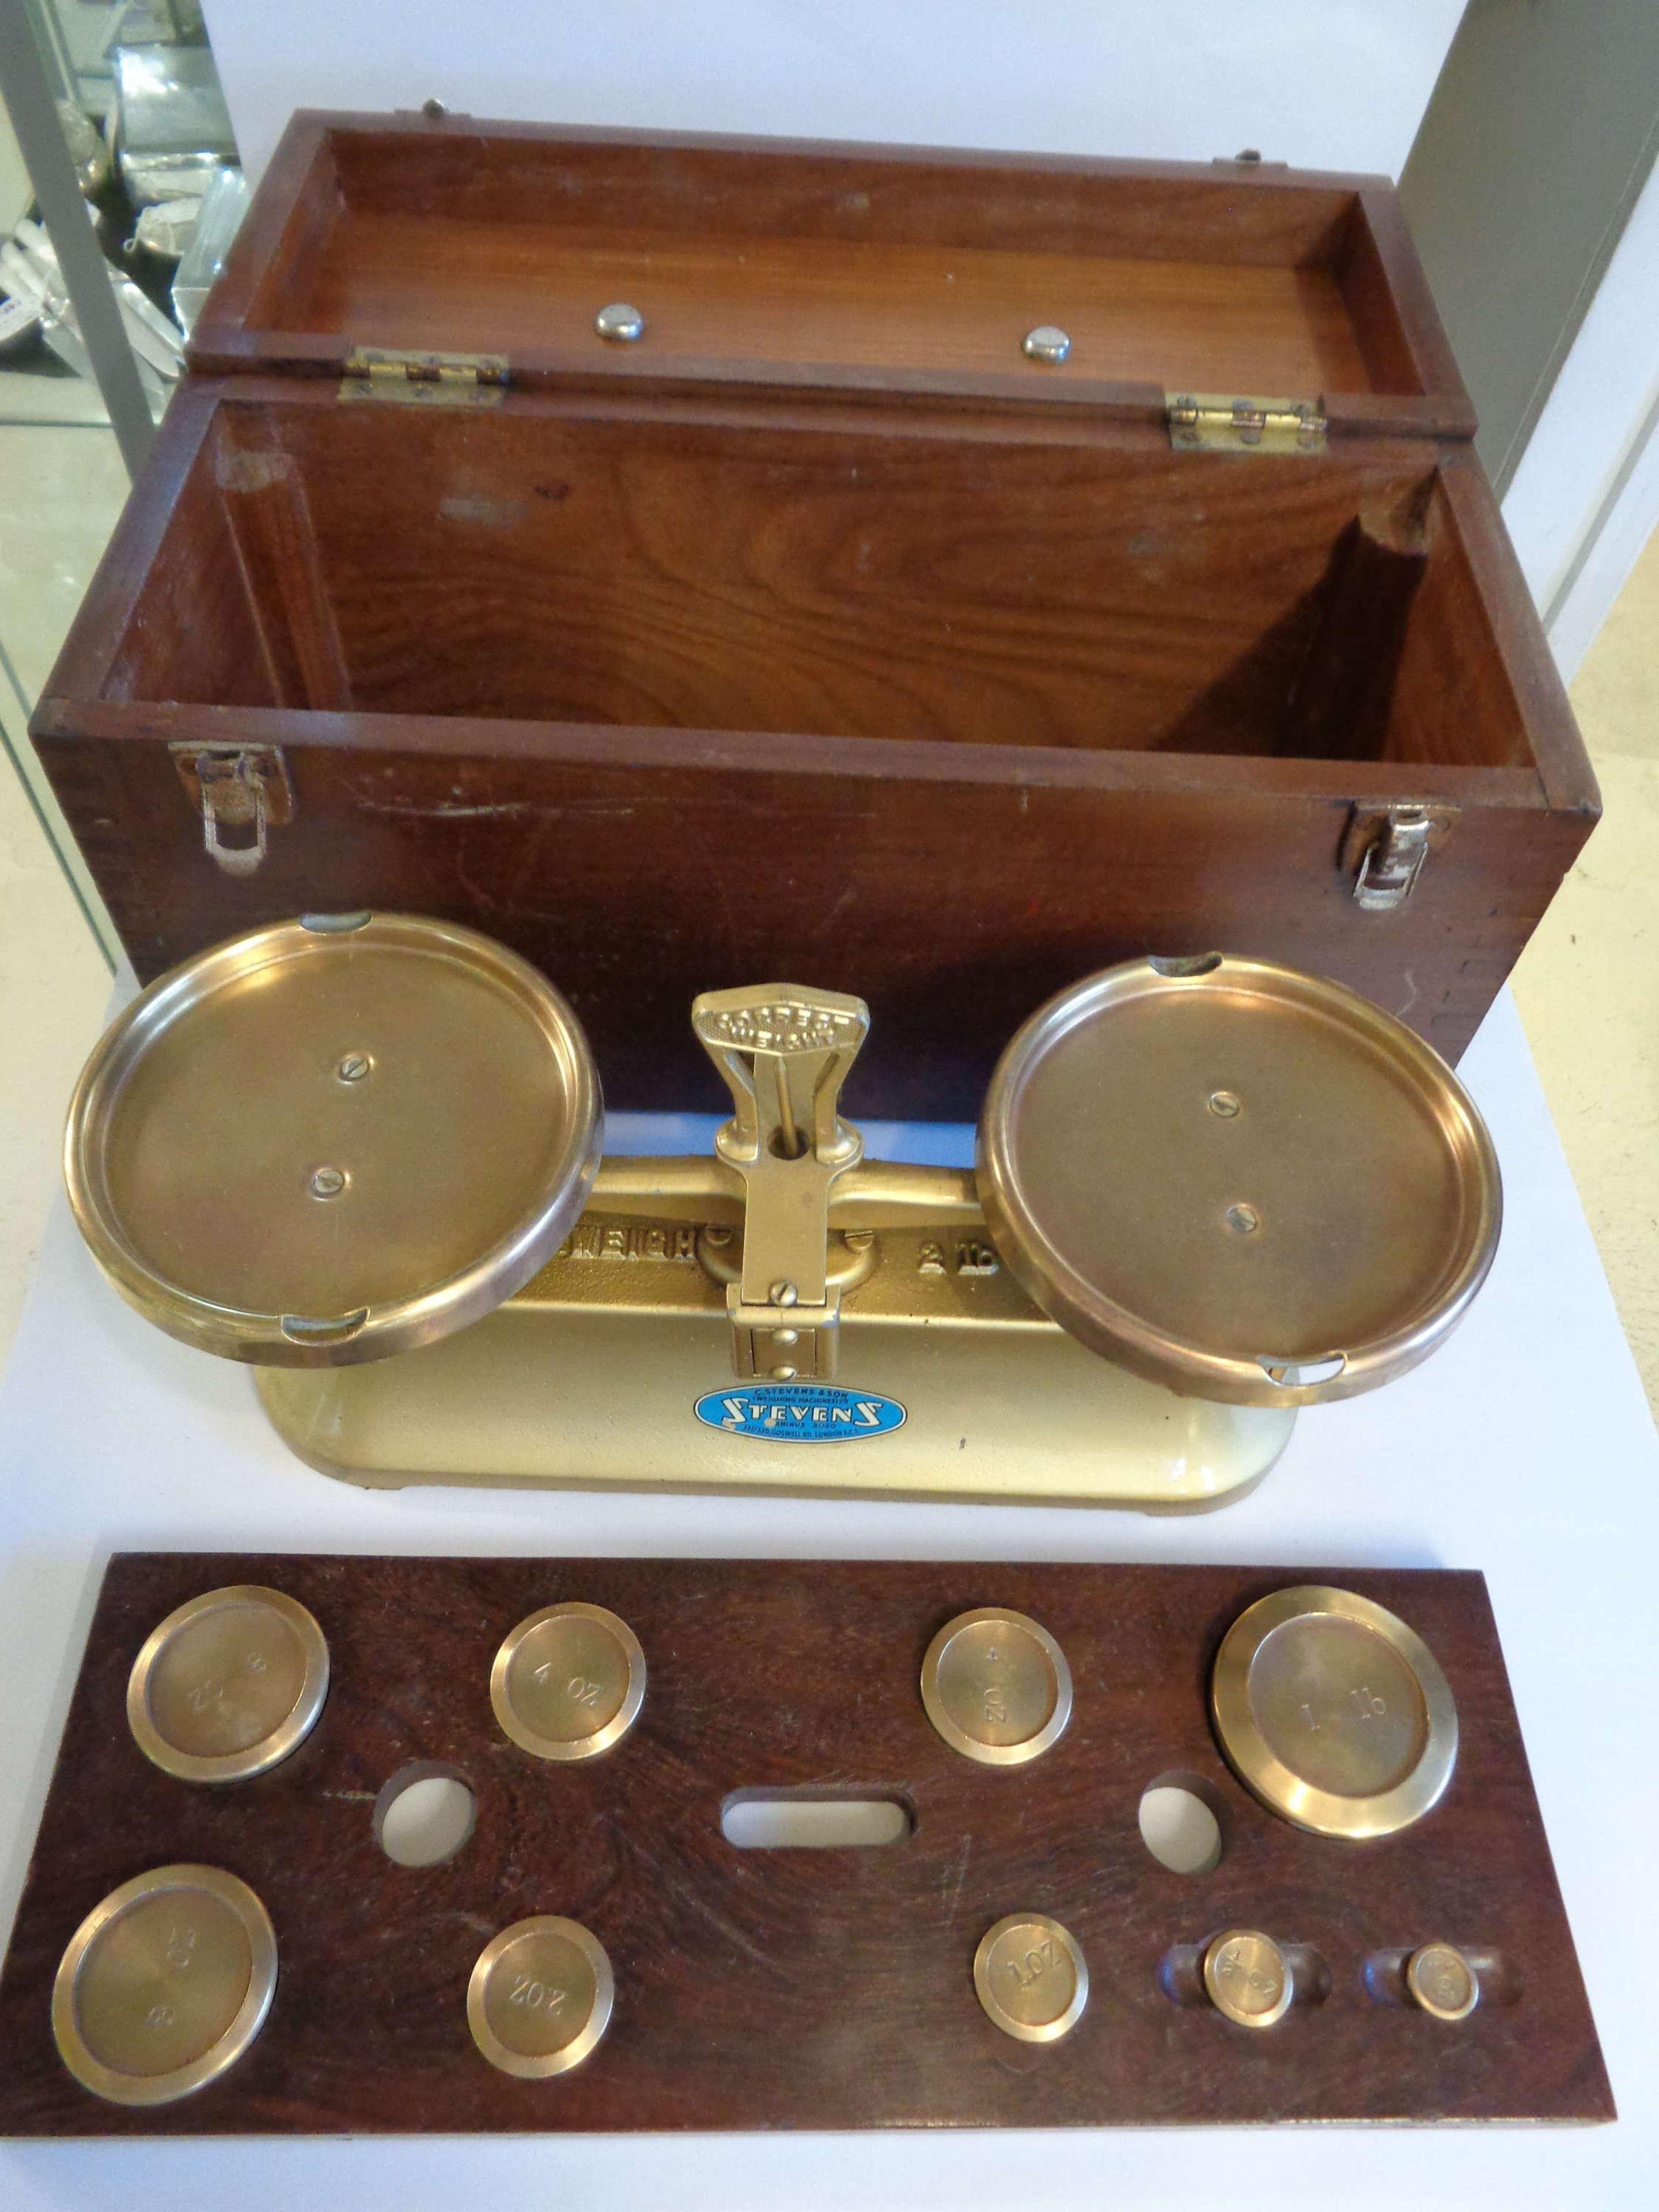 Vintage Stevens Brass Weighing Scales